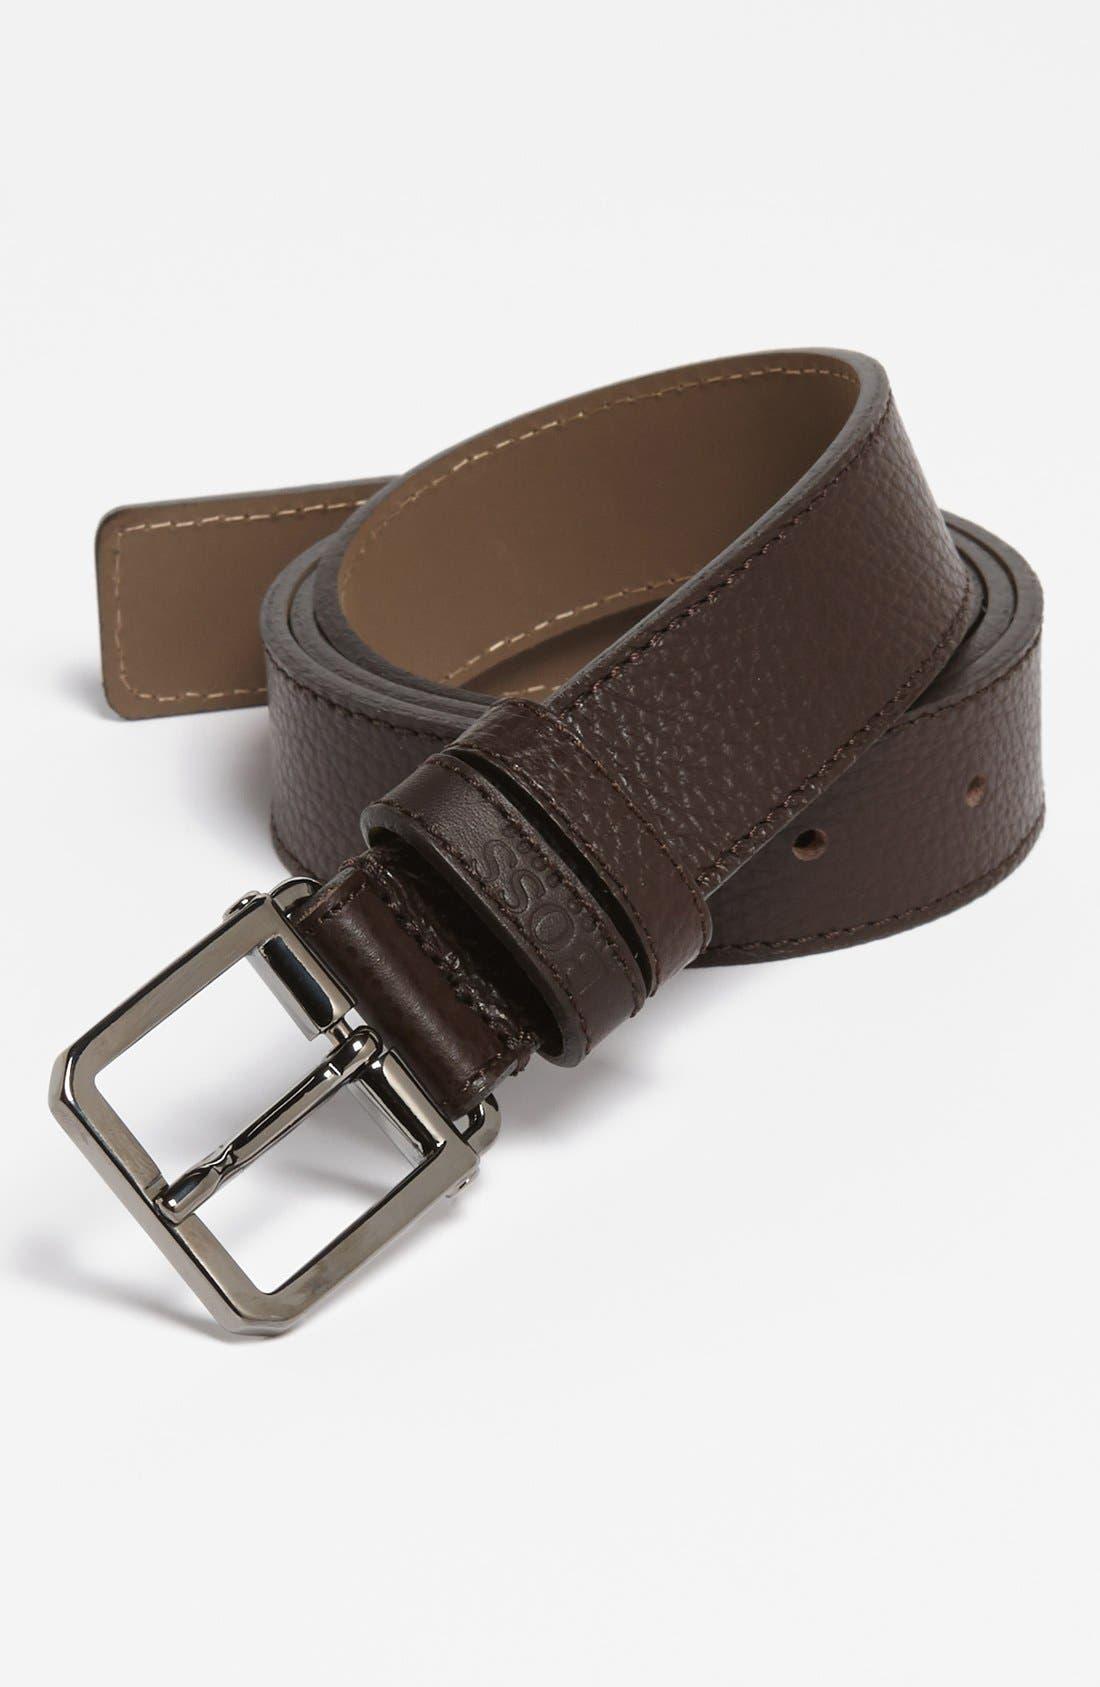 Main Image - BOSS HUGO BOSS 'Crosby' Leather Belt